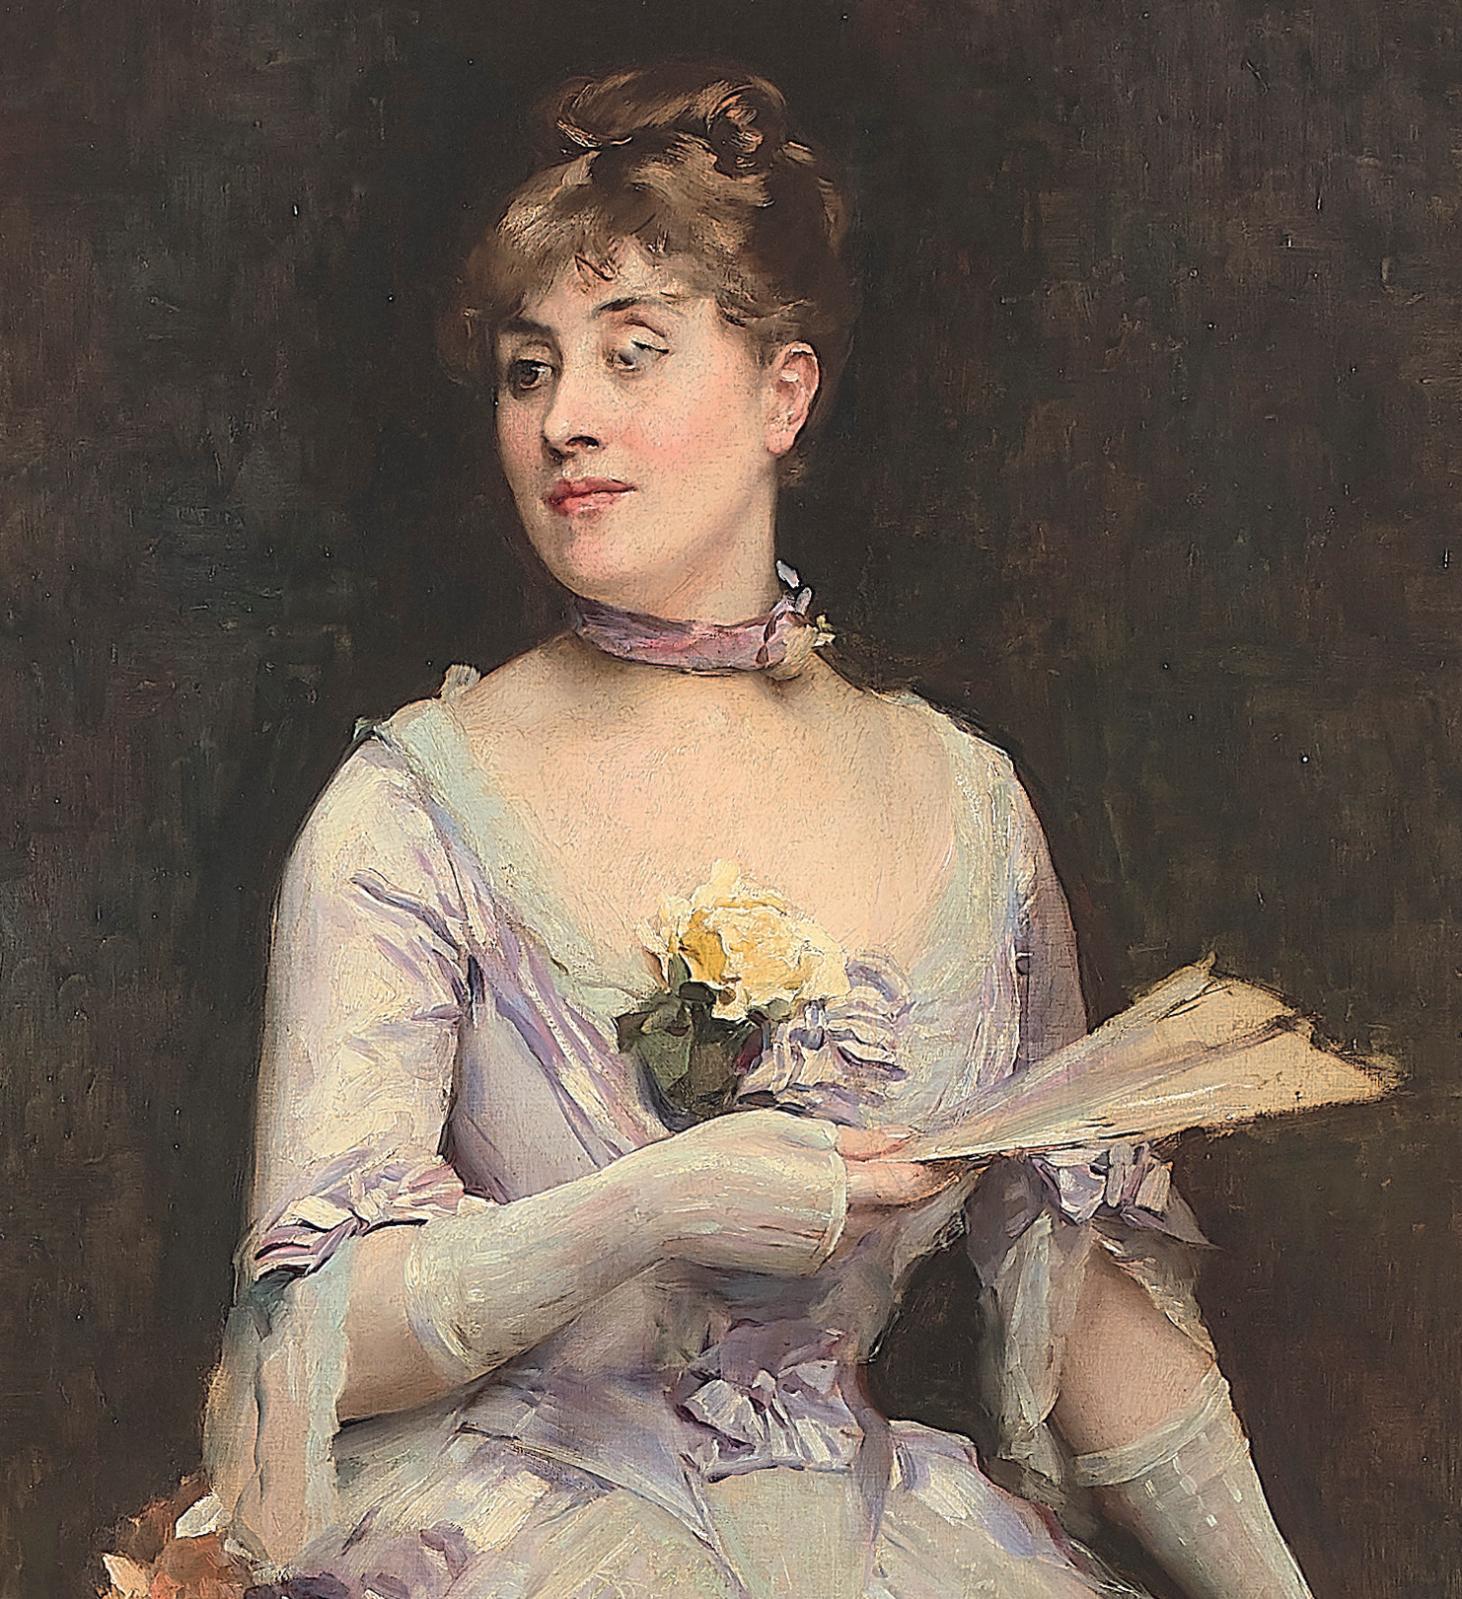 €65,000Raimundo de Madrazo y Garreta (1841–1920), detail of Portrait of Mrs. Laure Hayman wearing a choker, oil on canvas, 181 x 75 cm (71